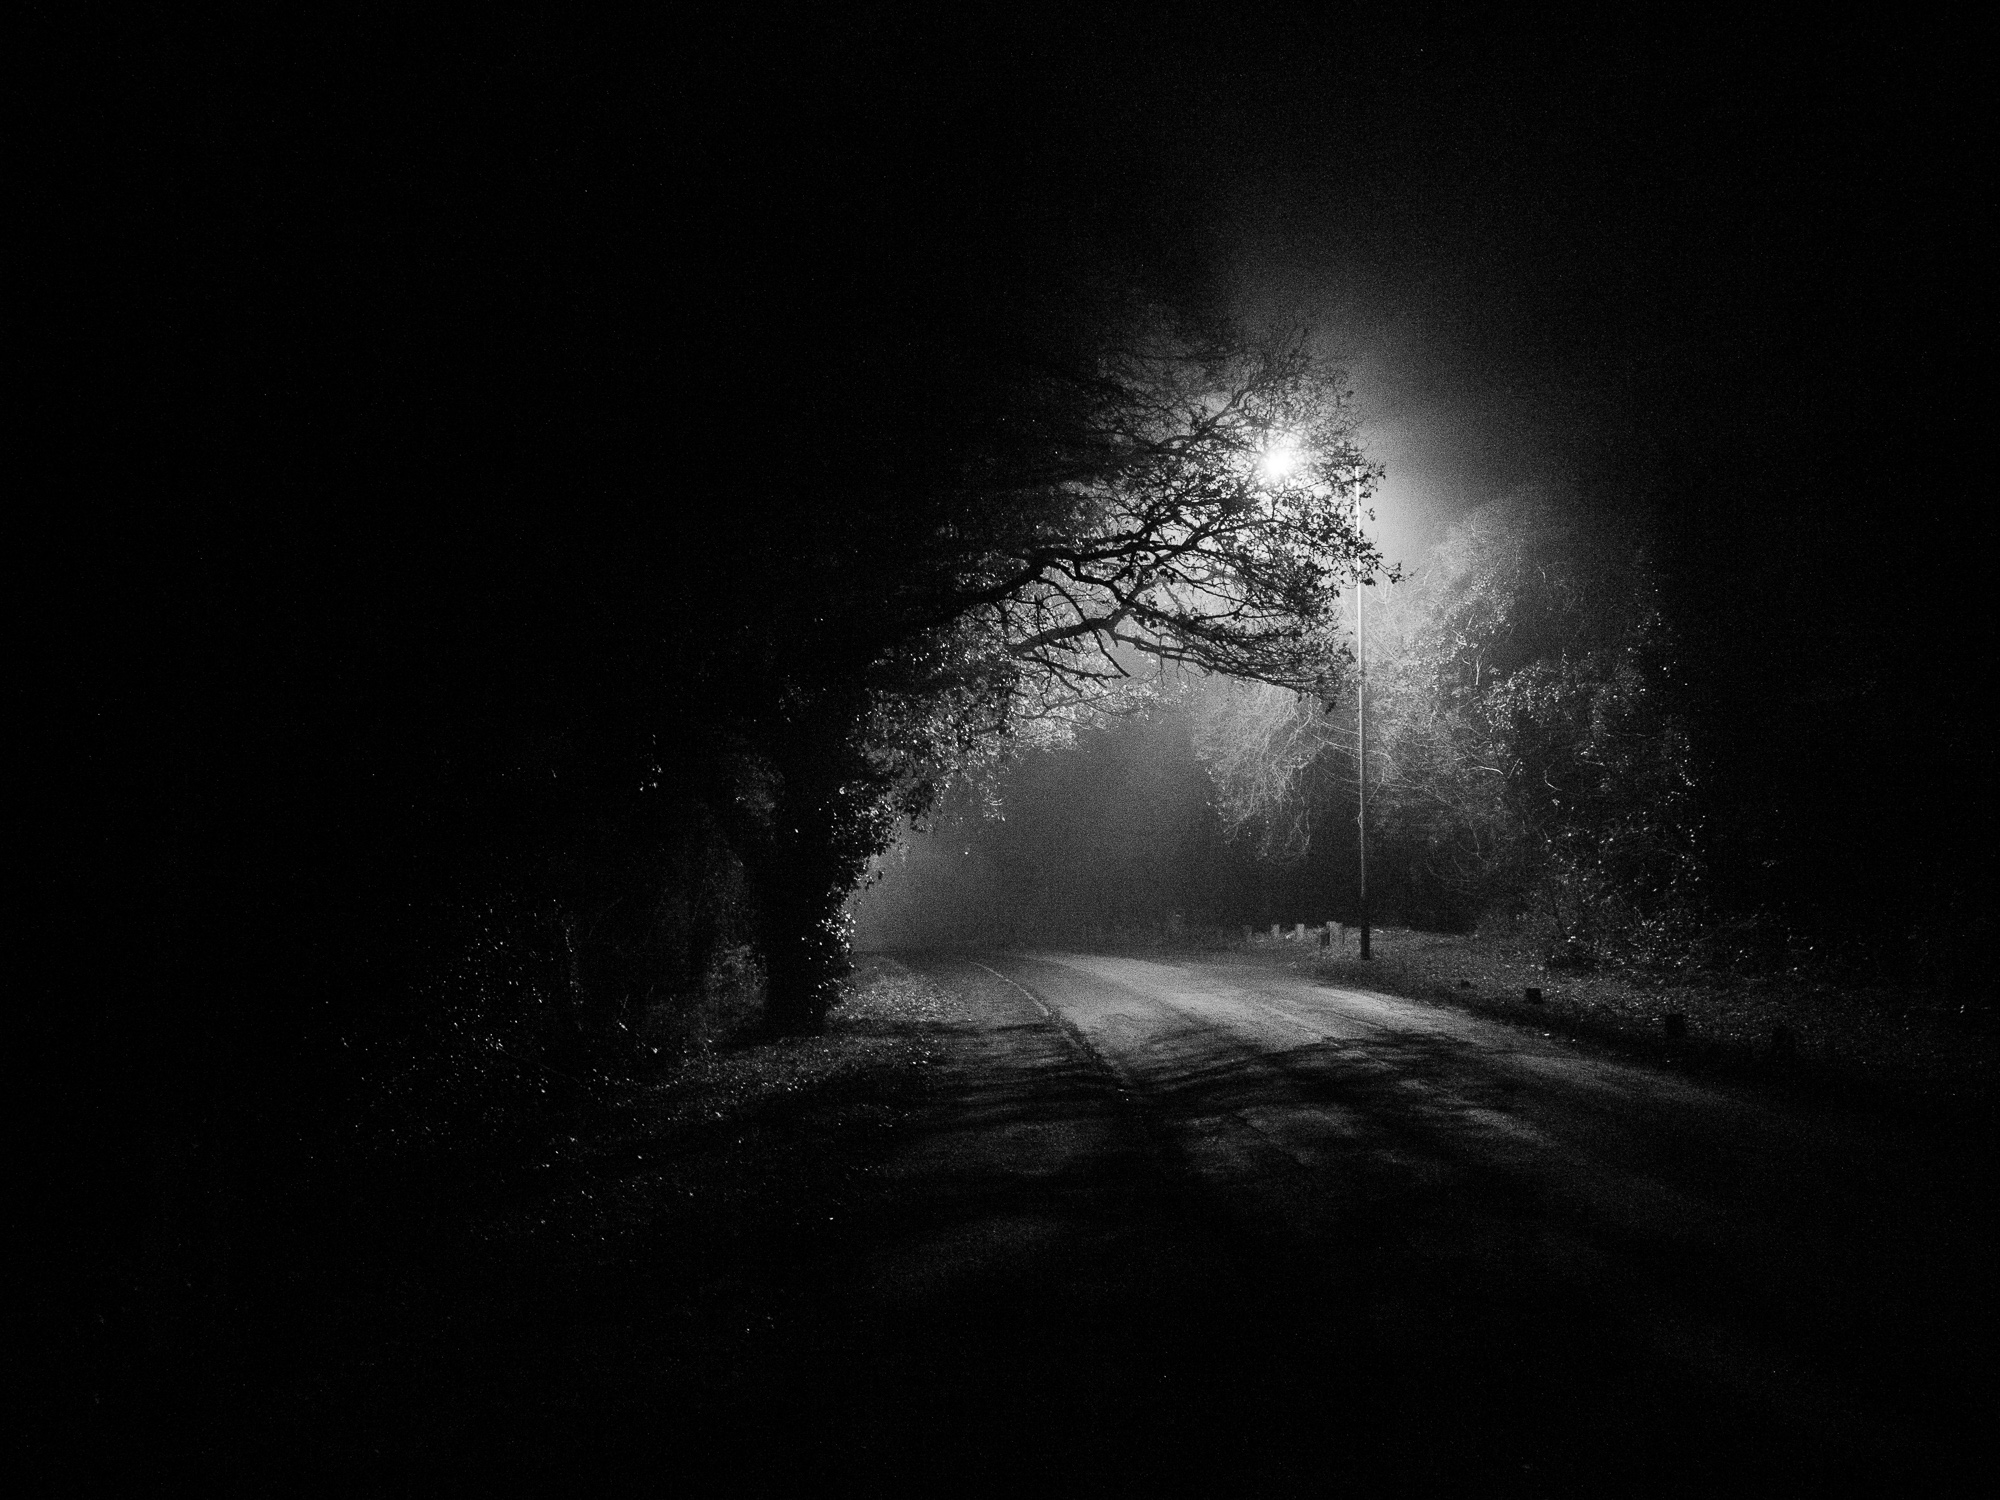 AngeloGifford_03_night-2_2000px.jpg